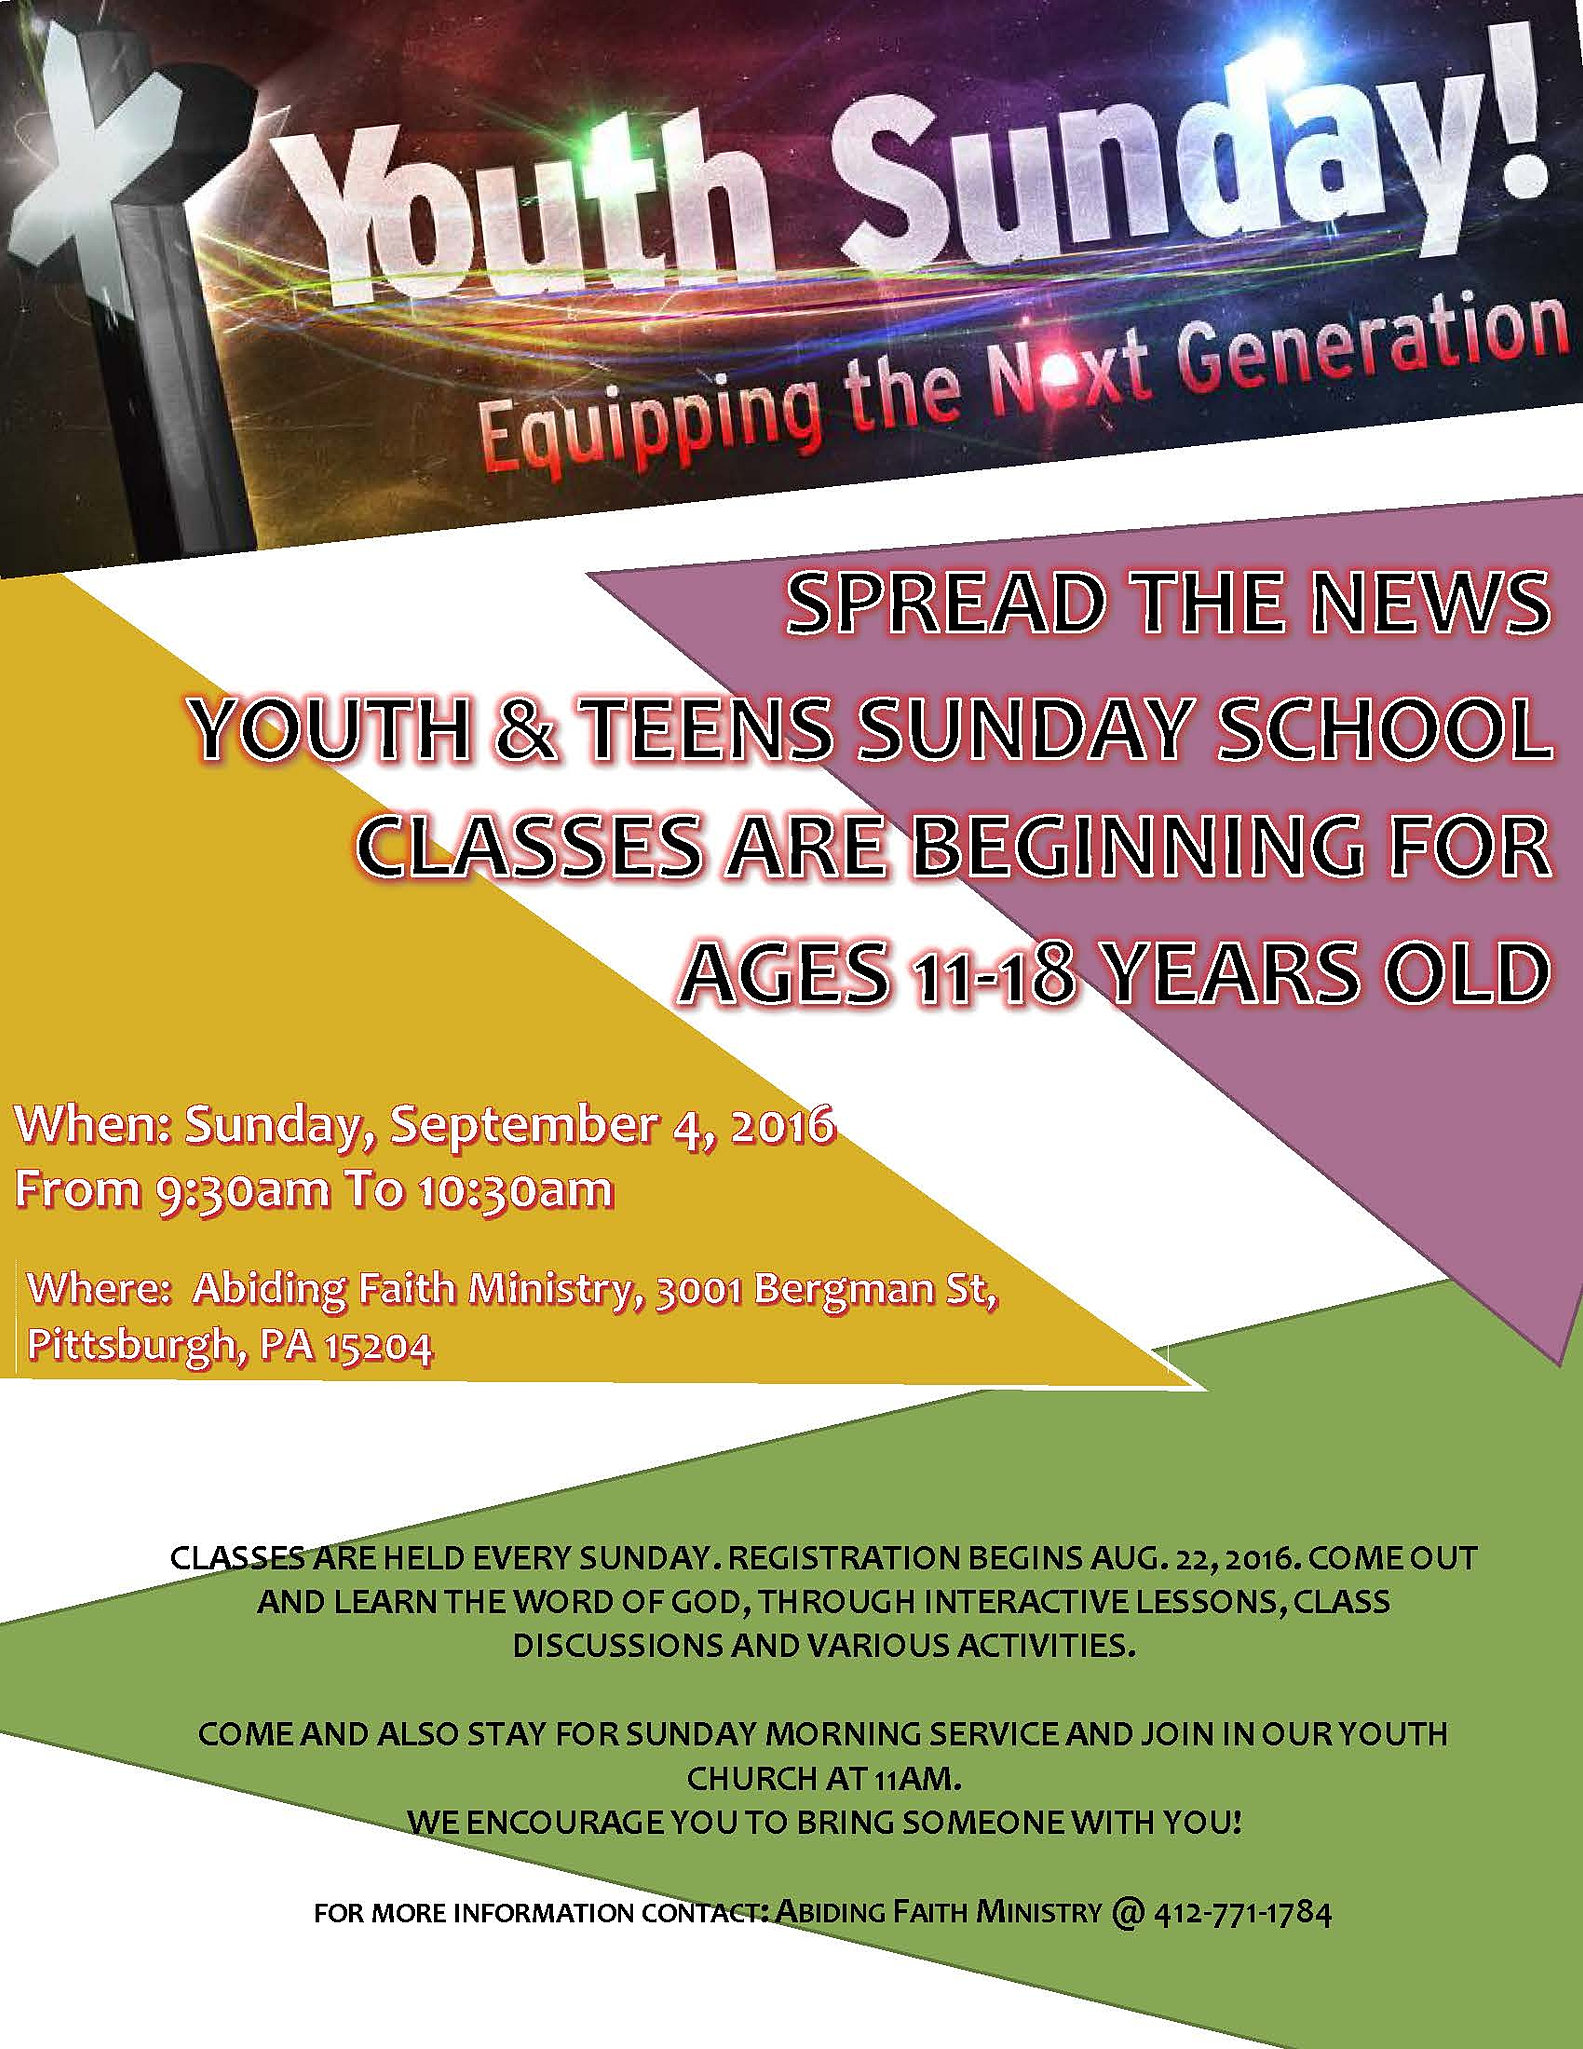 media ministry youth sunday school